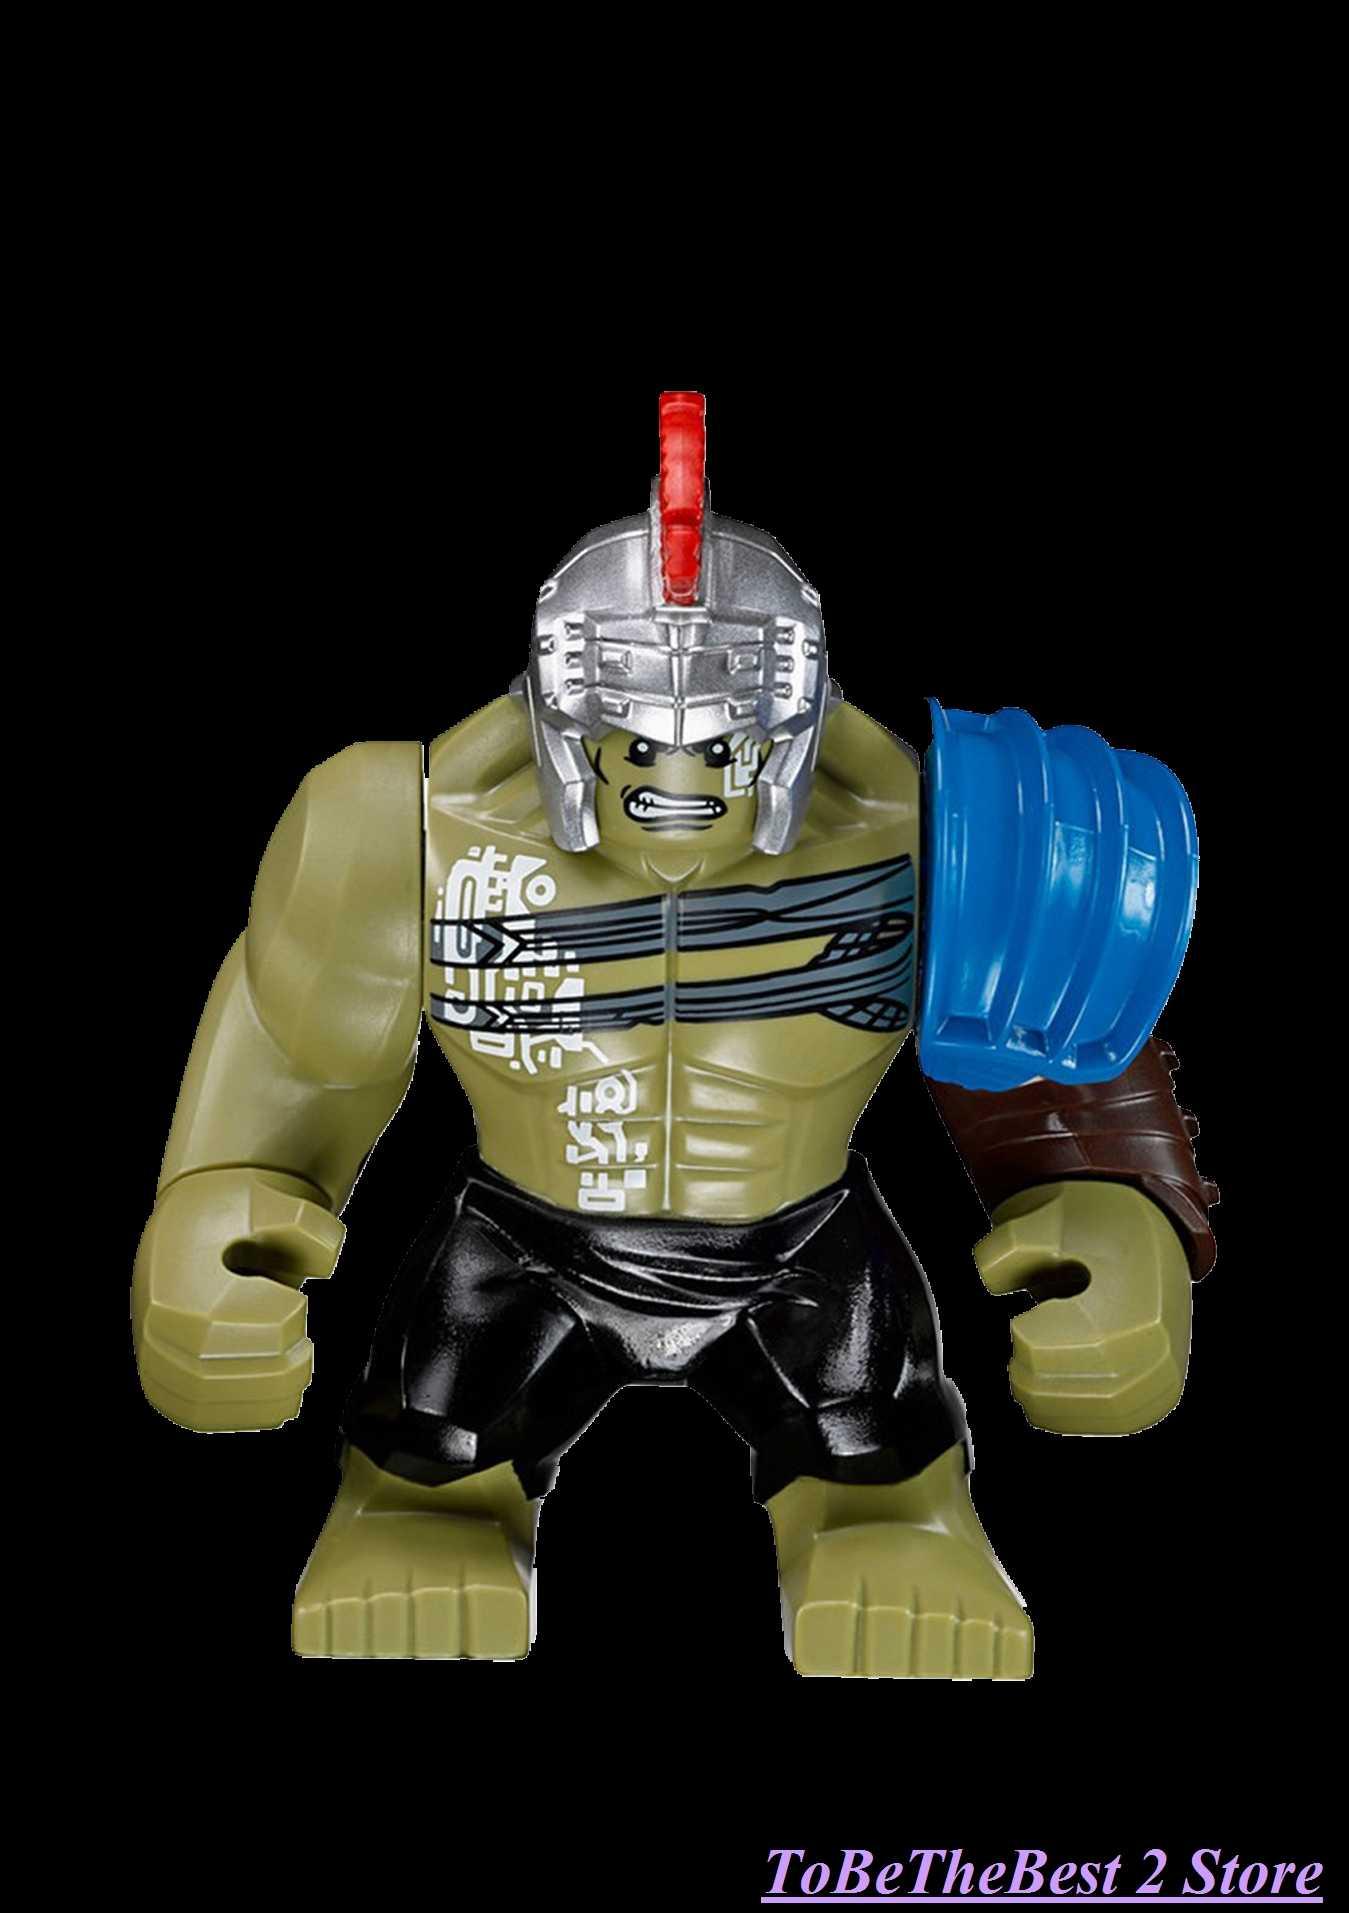 Legoing Hot Sale Marvel Super Heroes Thanos Figures Marvel Endgame Avengers 4 Building Blocks Kits Sets Kids Toys Gift Legoingly